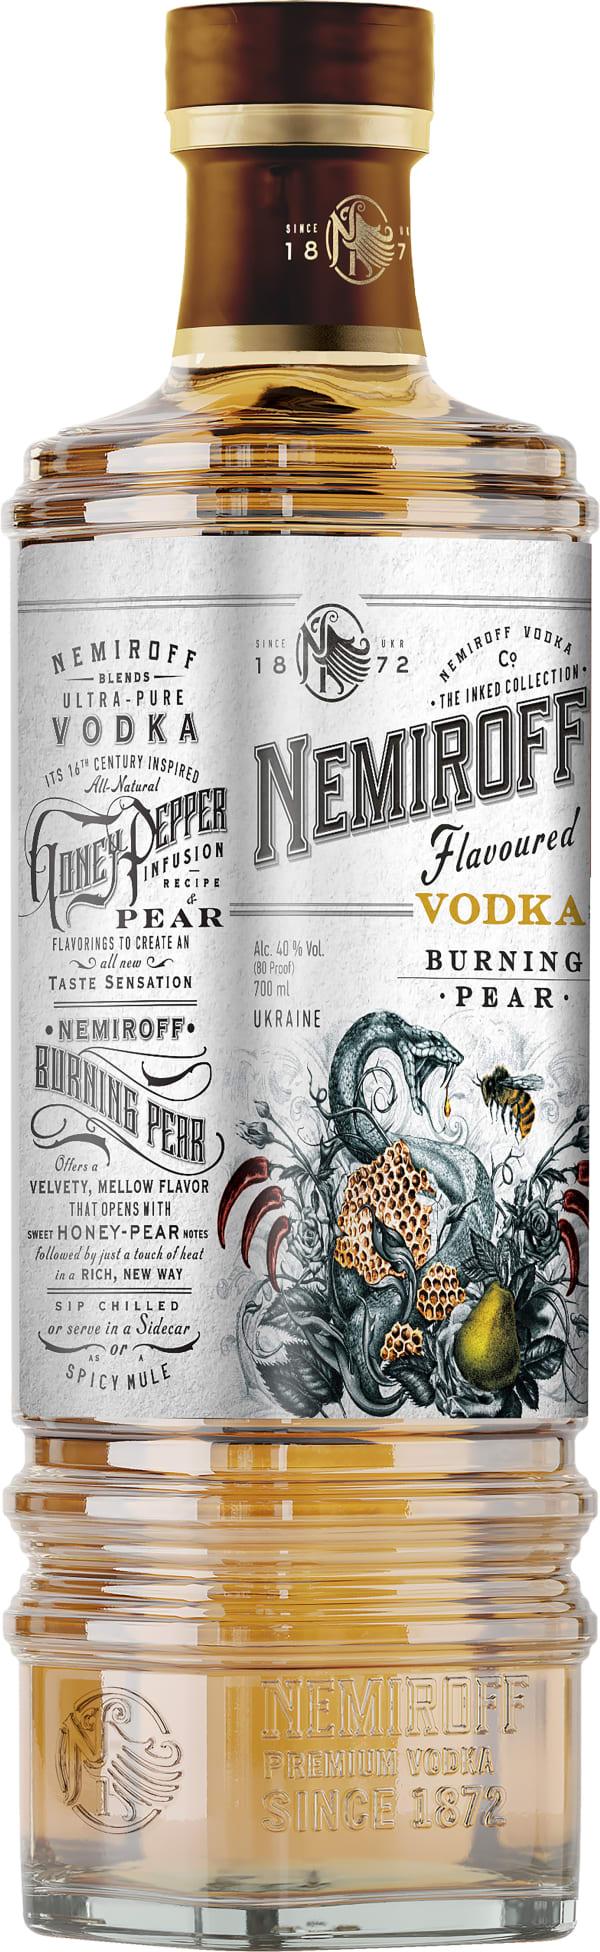 Nemiroff Flavoured Vodka Burning Pear